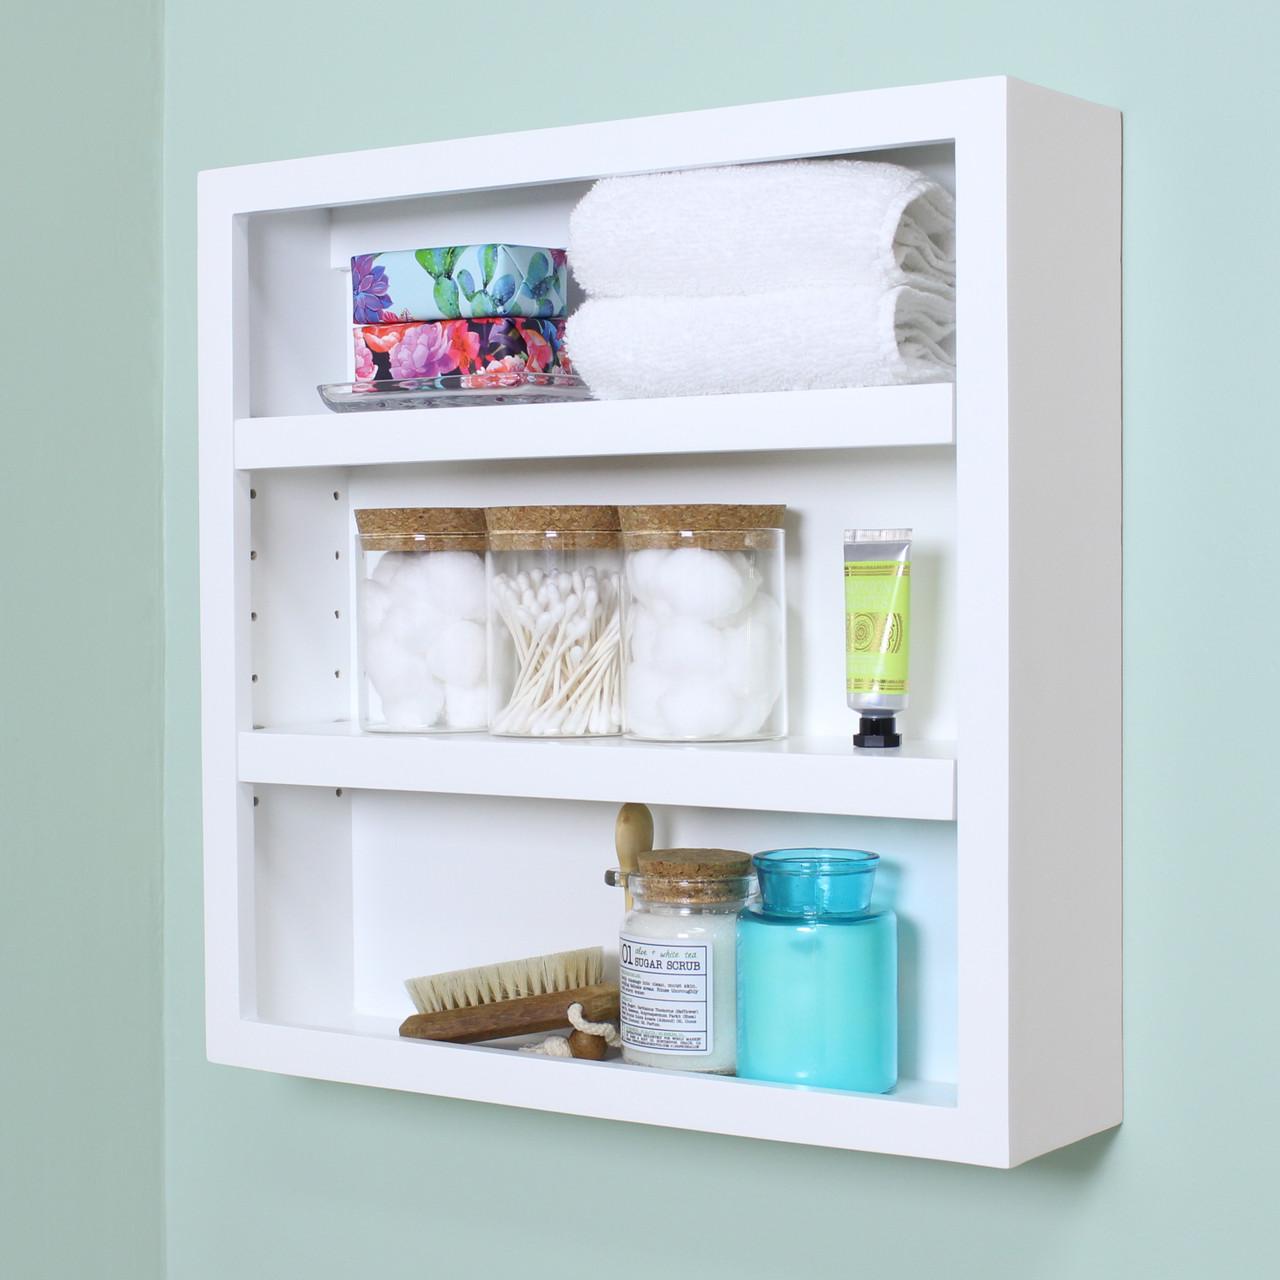 18x18 IMPERFECT White Jemma Wall Shelf by Fox Hollow Furnishings